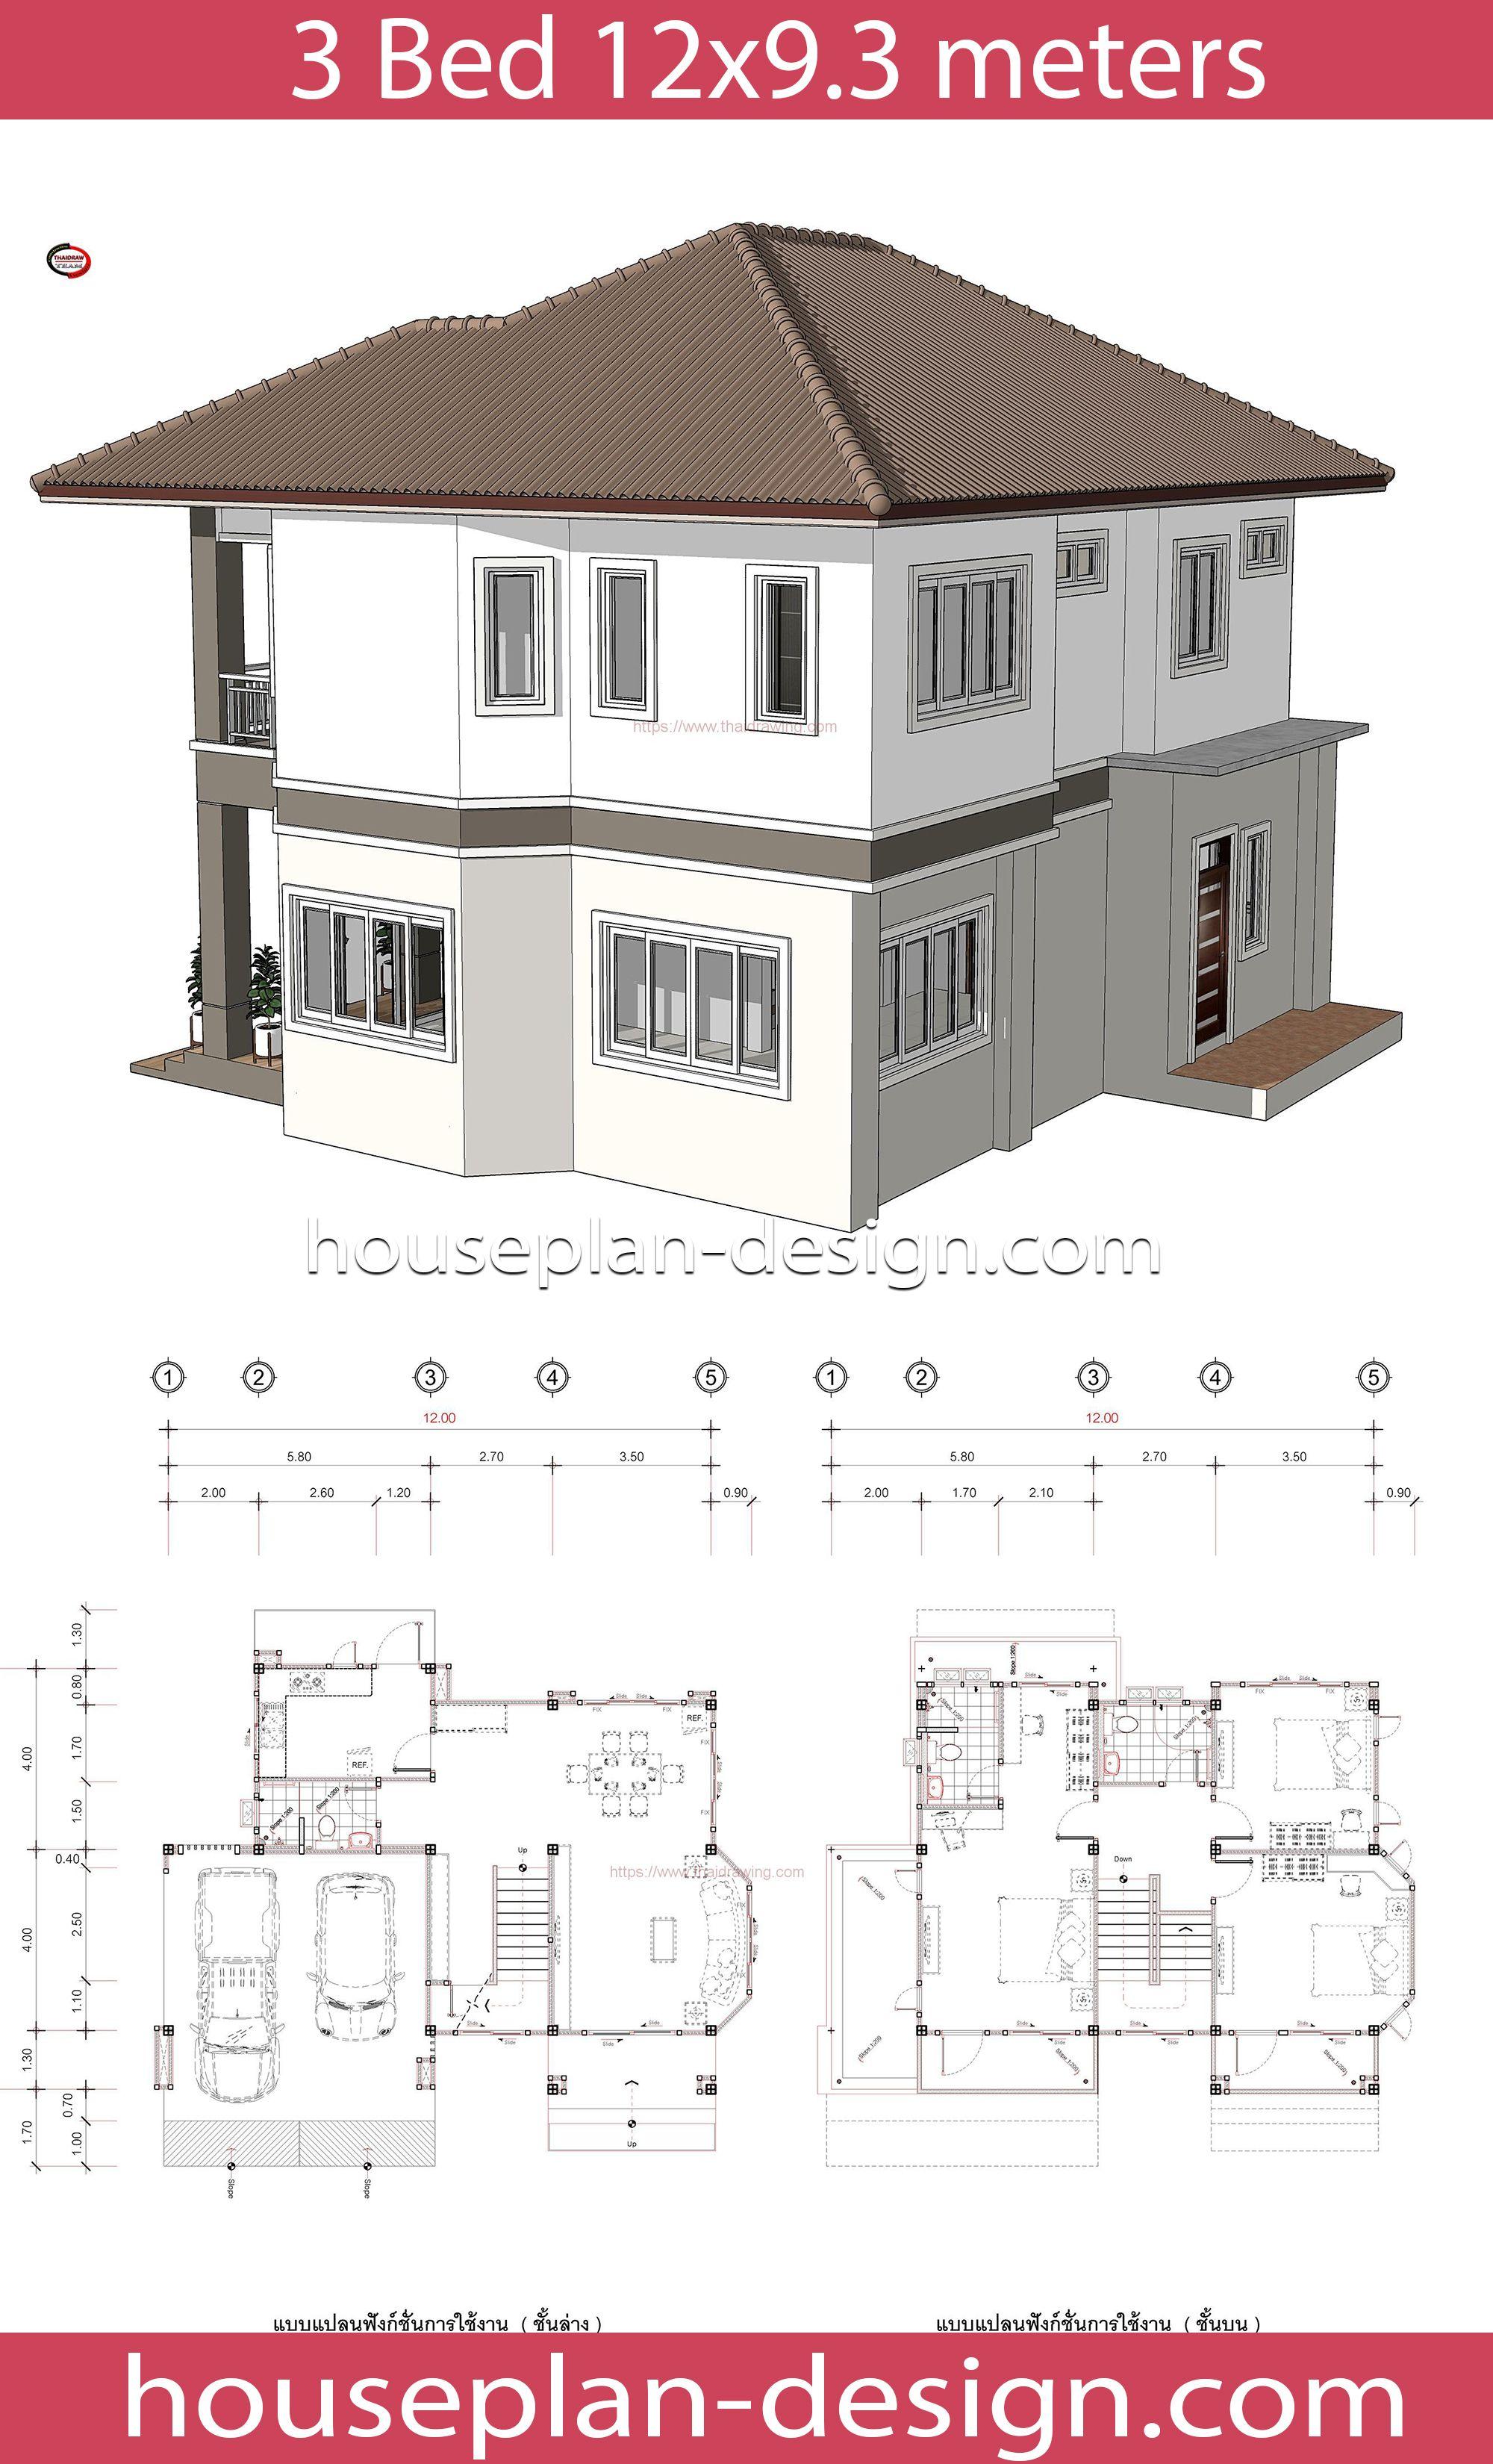 House Plan Design House Design Idea 12x9 3 With 3 Bedrooms Projetos De Casas Arquitetonico Casas